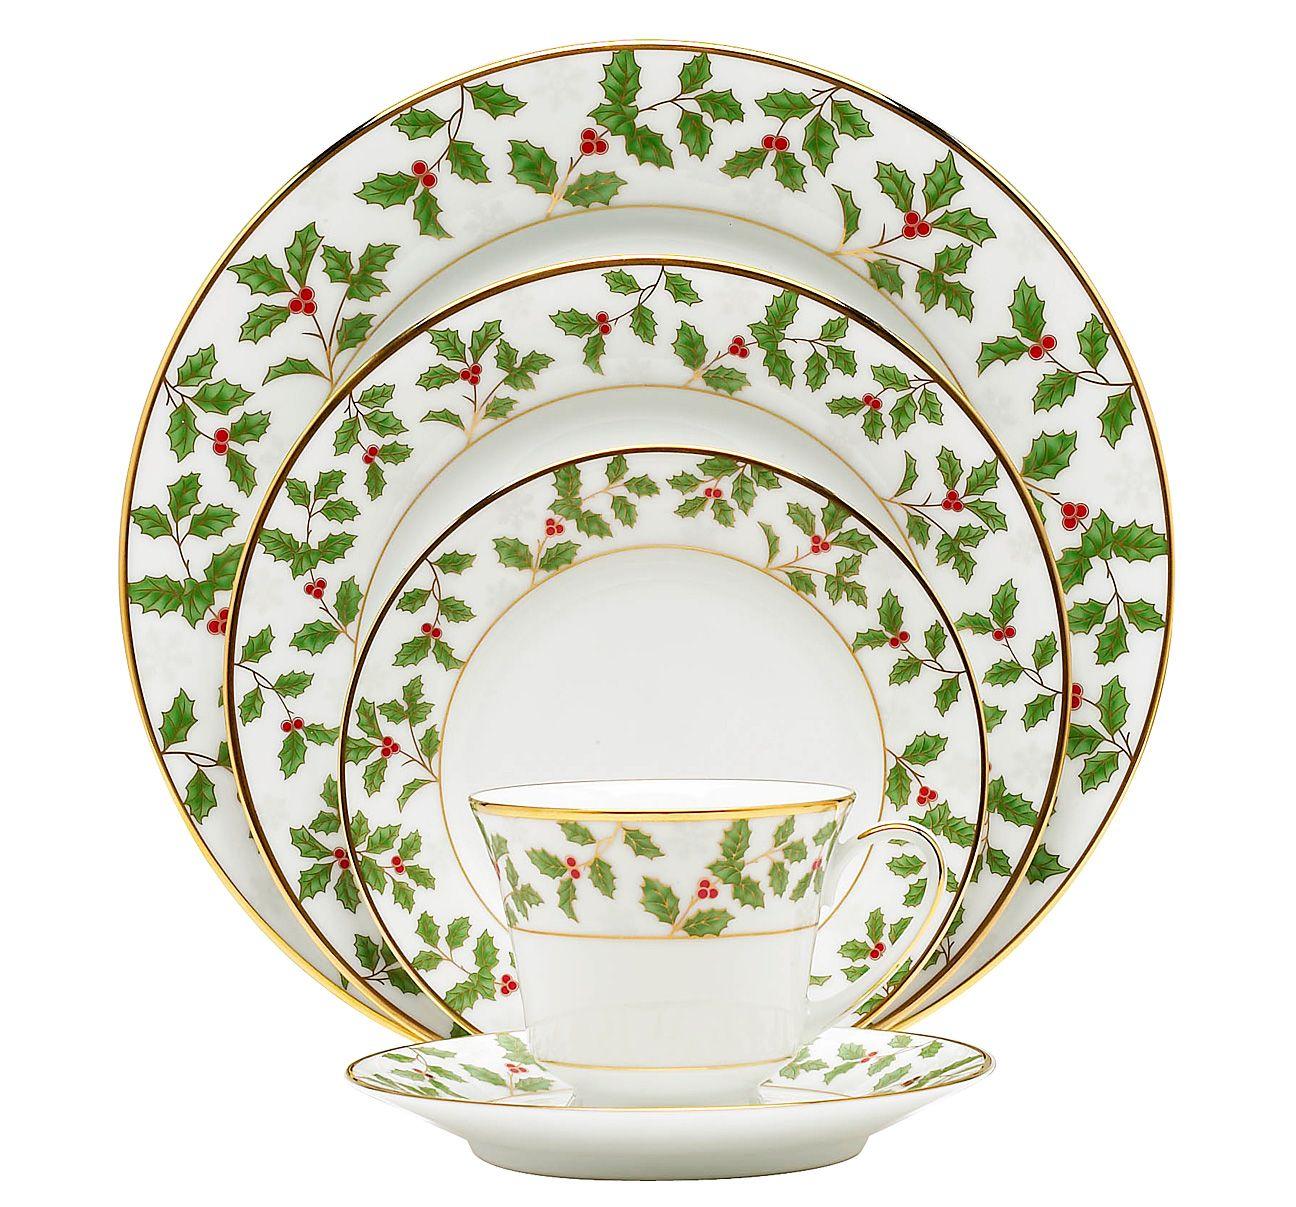 Noritake China: Giftware Items: Holiday: Holly and Berry Gold ...